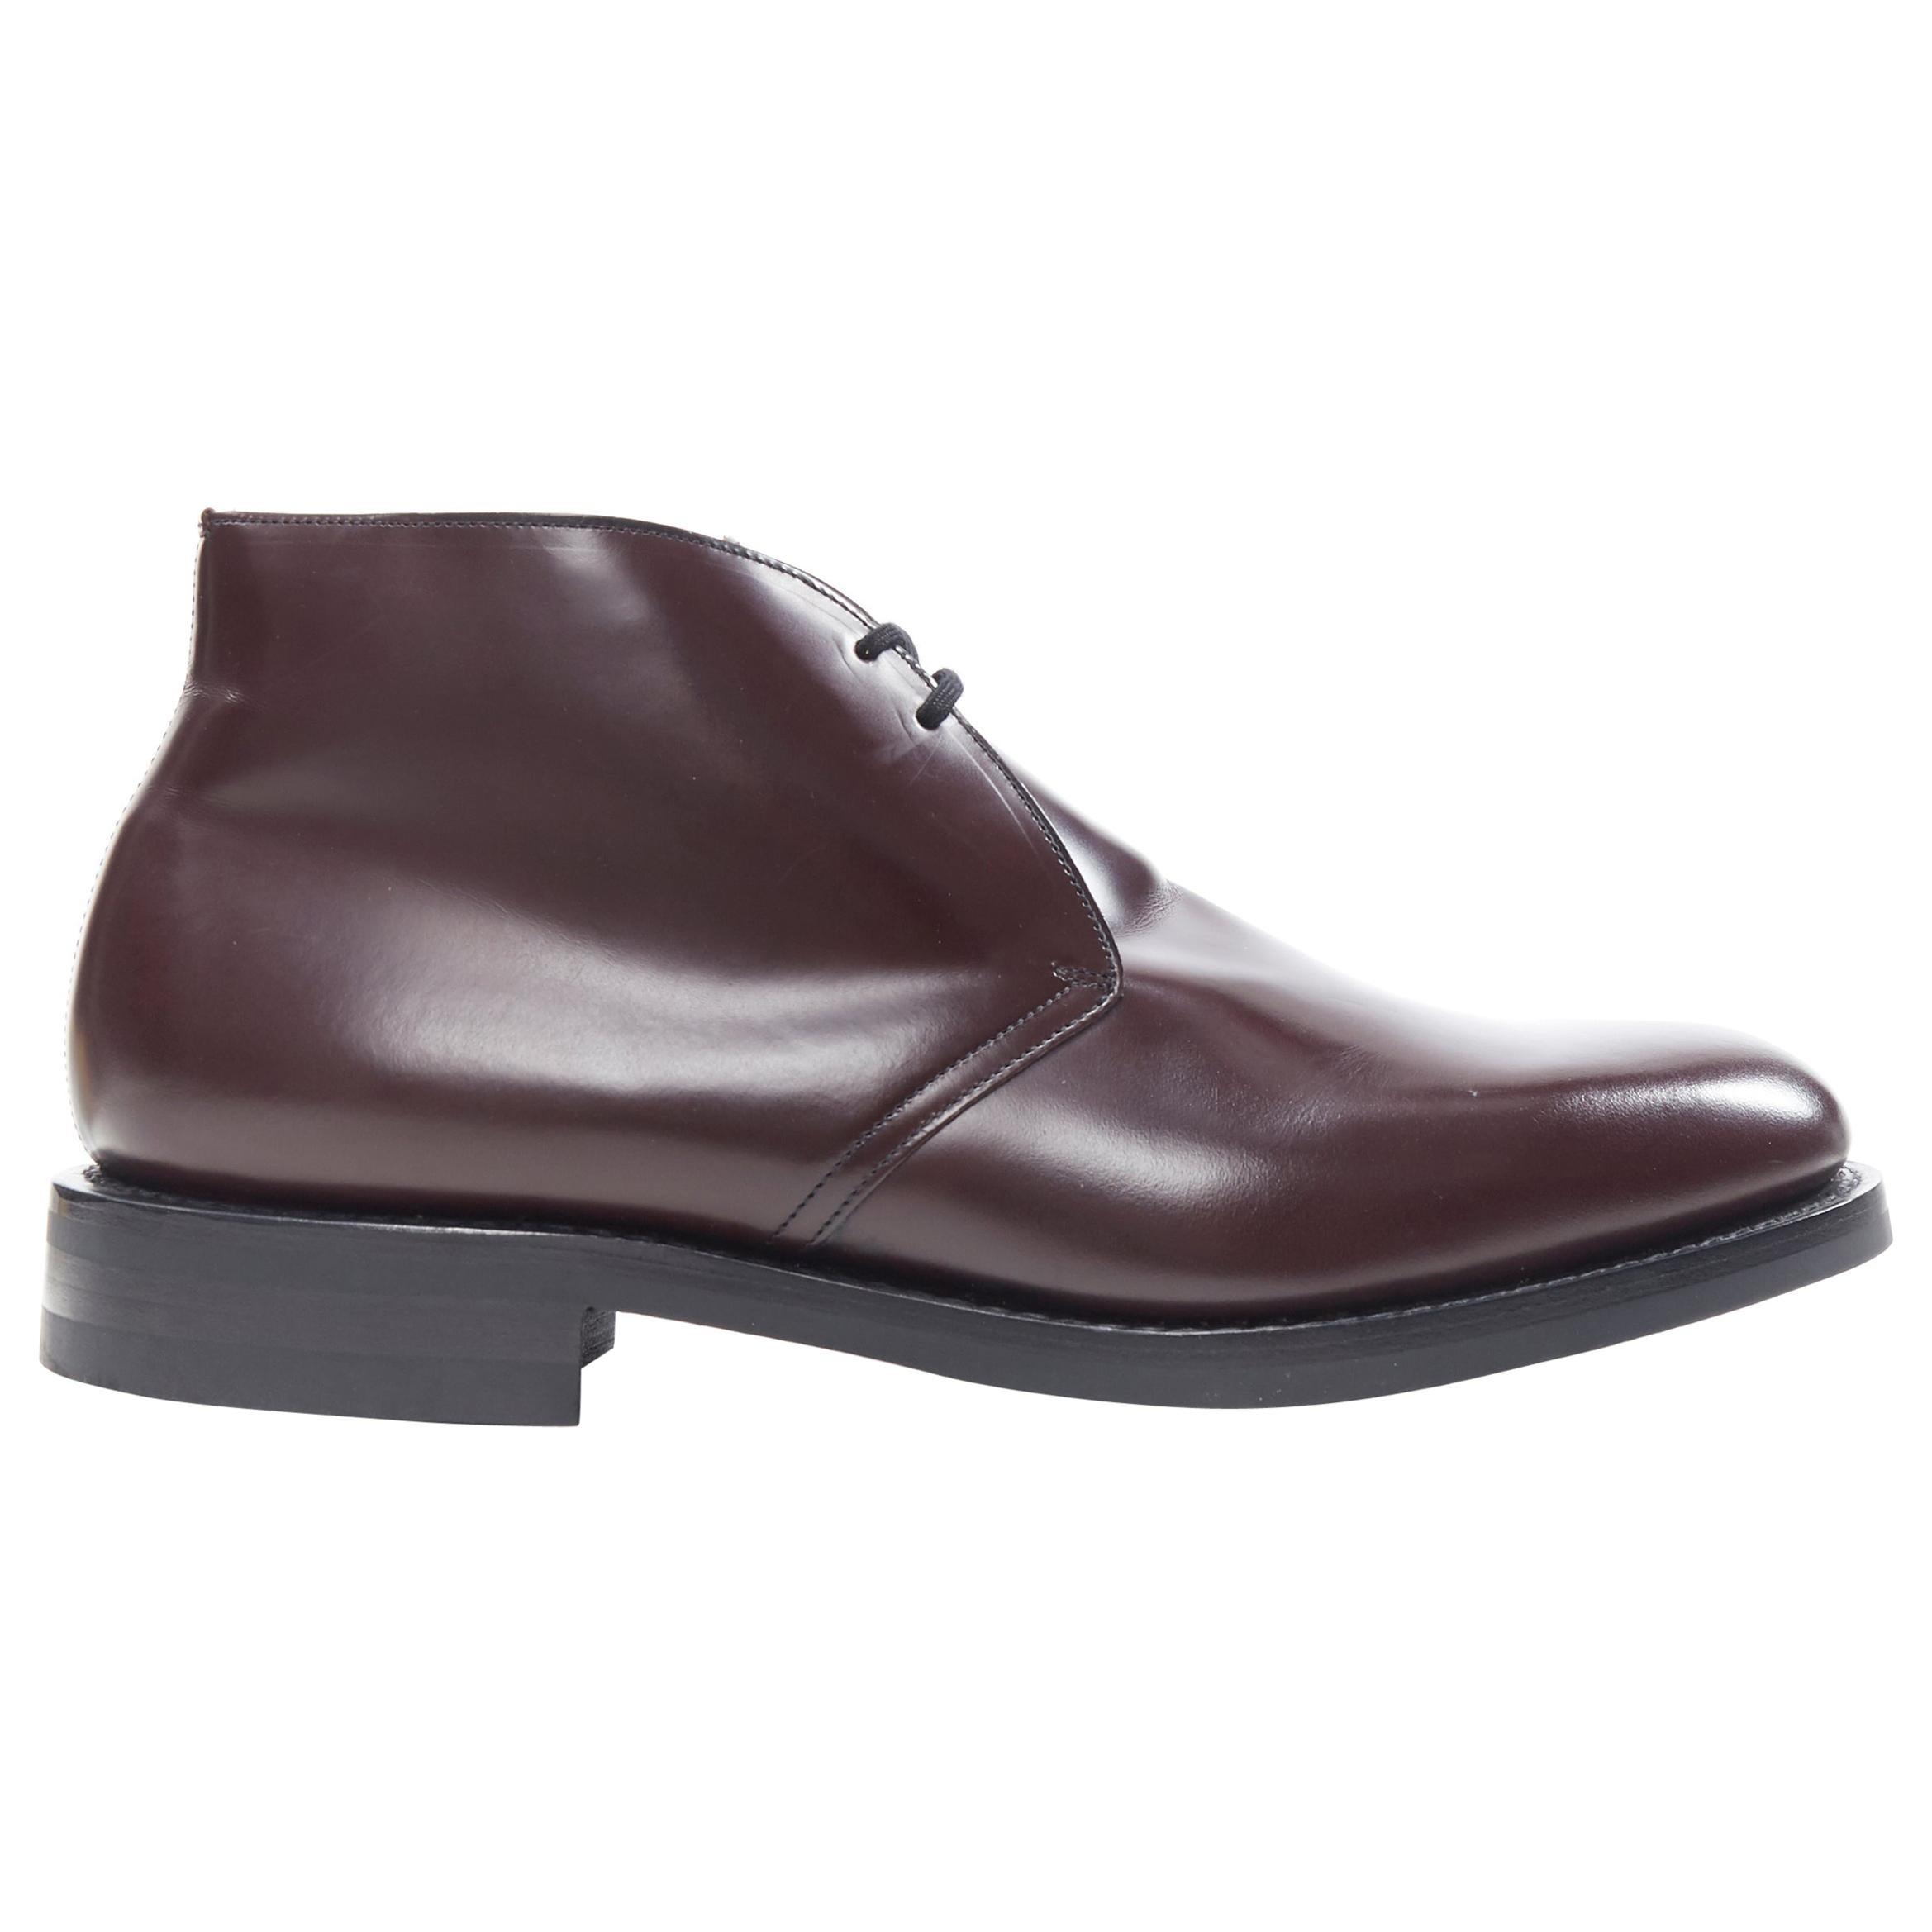 new CHURCHS Ryder 3 Burgundy Bright Calf polished leather chukka boots UK10 EU44